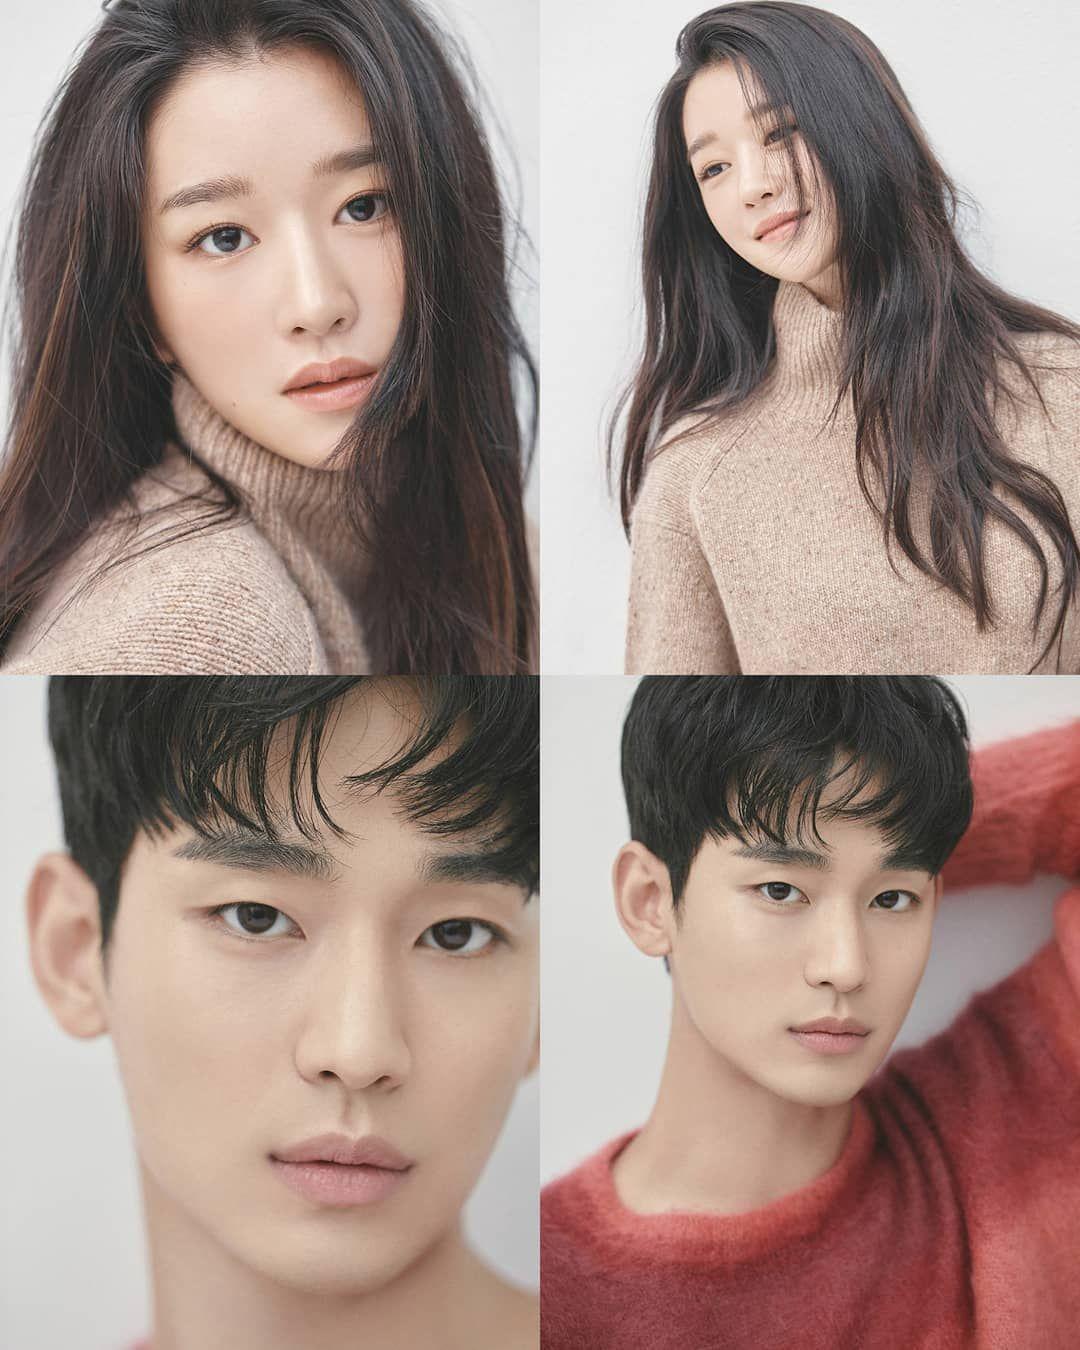 20 9k Likes 99 Comments It S Okay To Not Be Okay Tvn Itsokaytonotbeokay Tvn On Instagram Seo Yeji And Kim Soohyun Gambar Selebritas Aktris